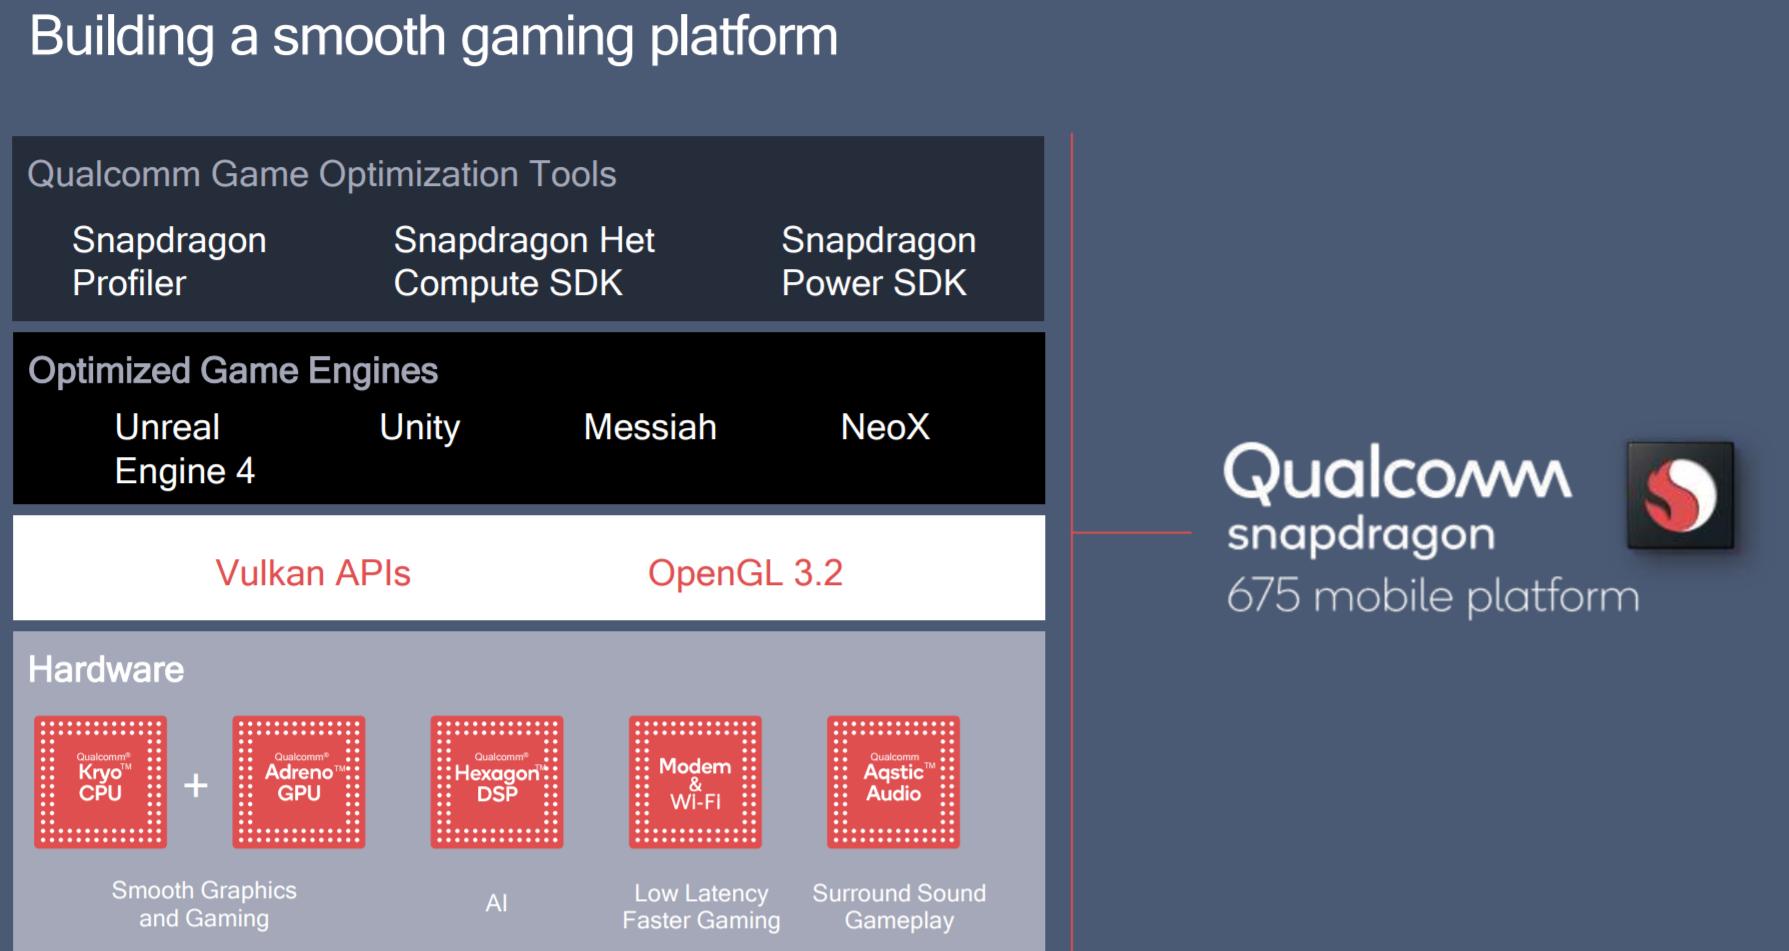 Qualcomm Snapdragon 675 Mobile Platform Coming Early 2019 - Legit